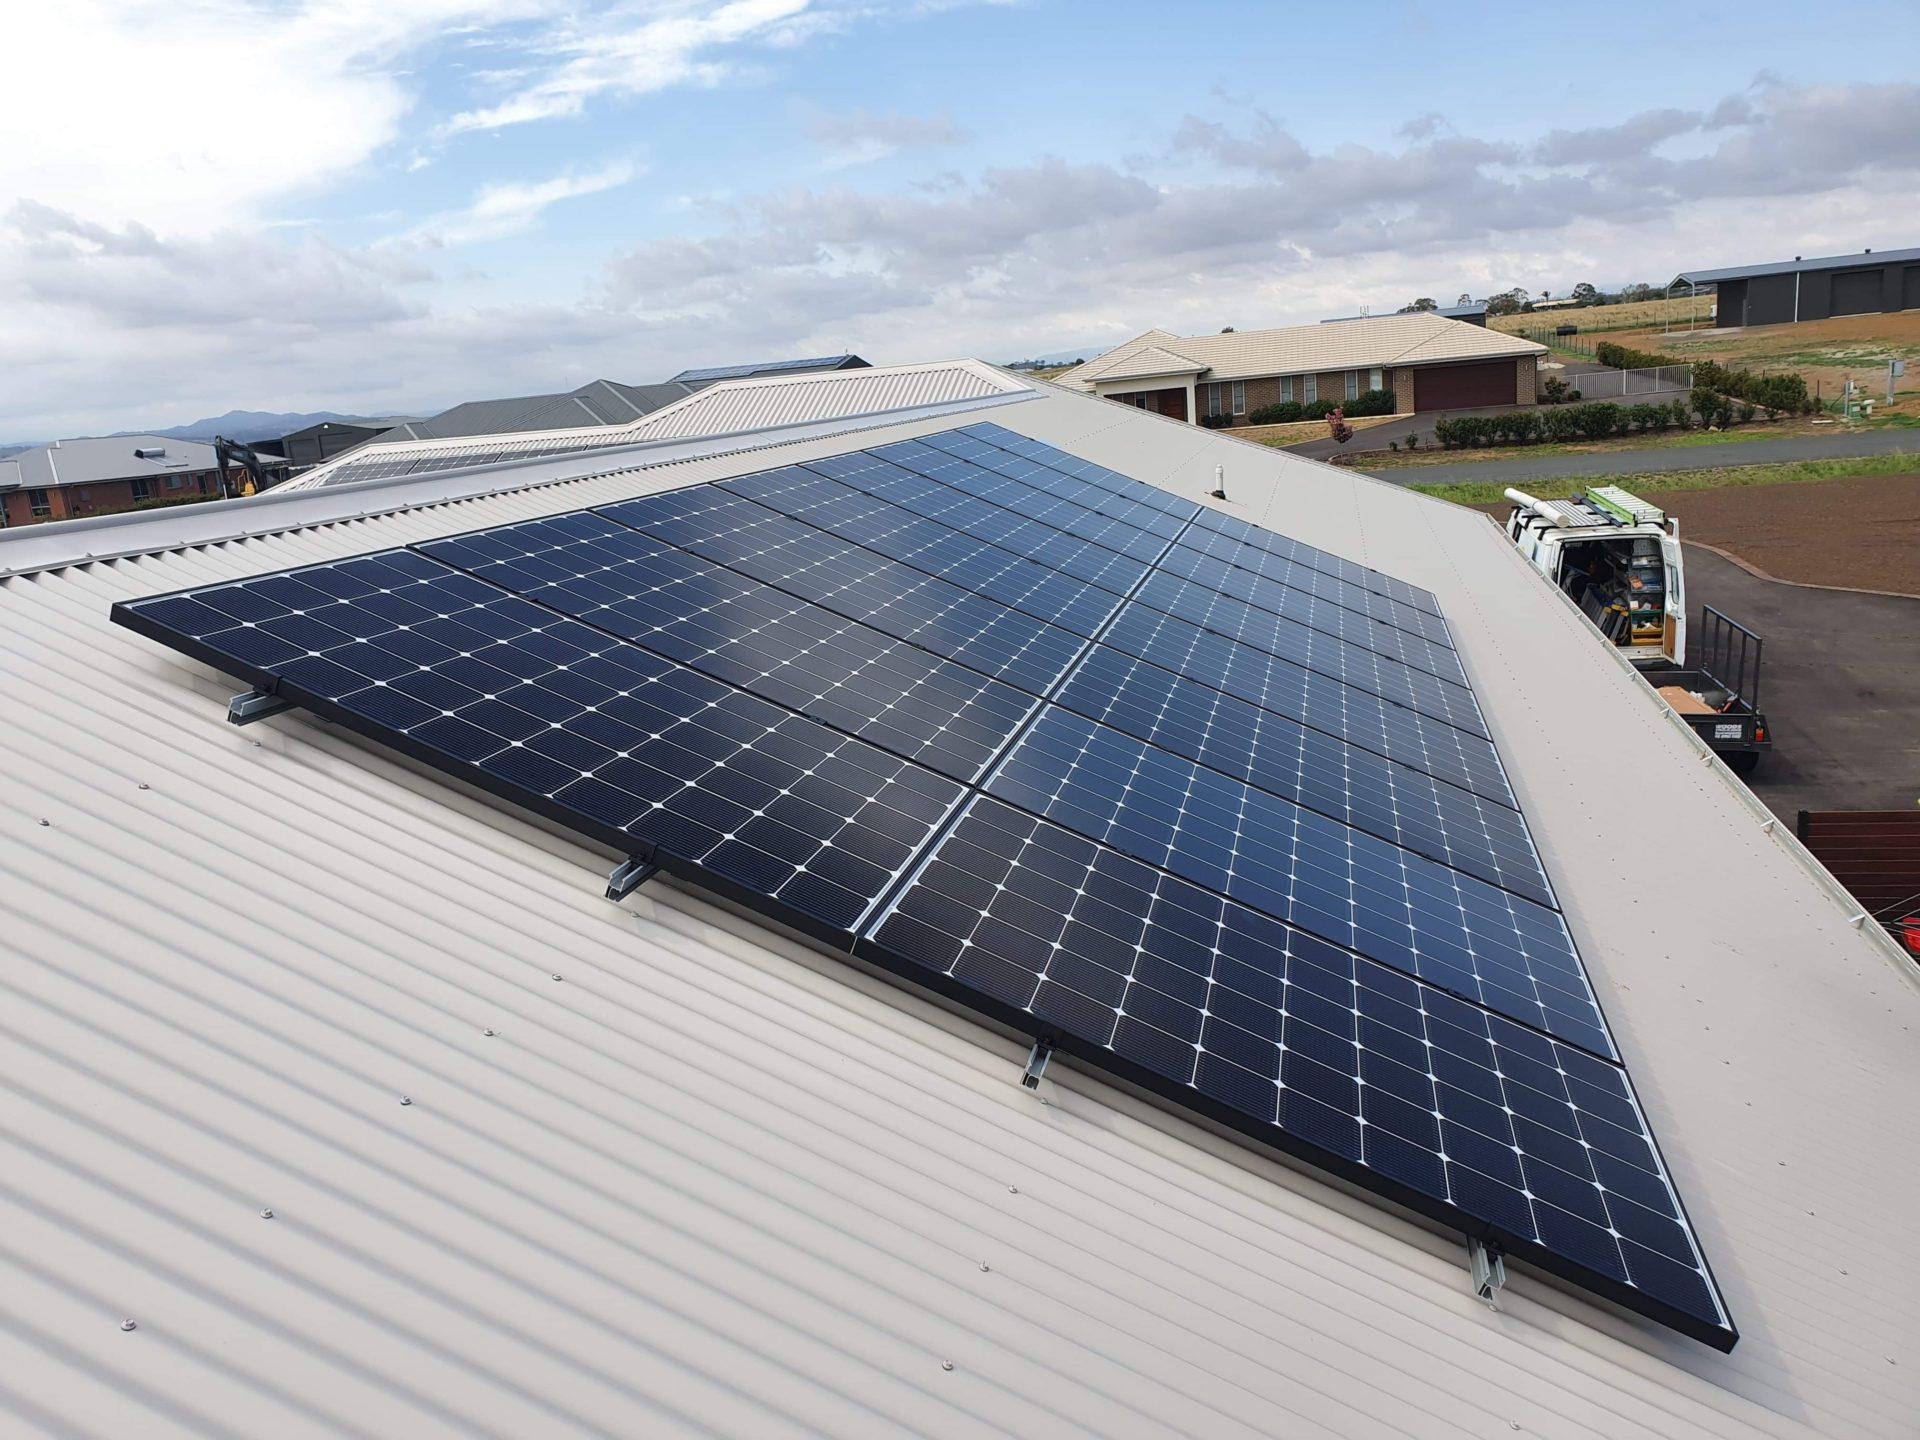 LG Panels Western Roof